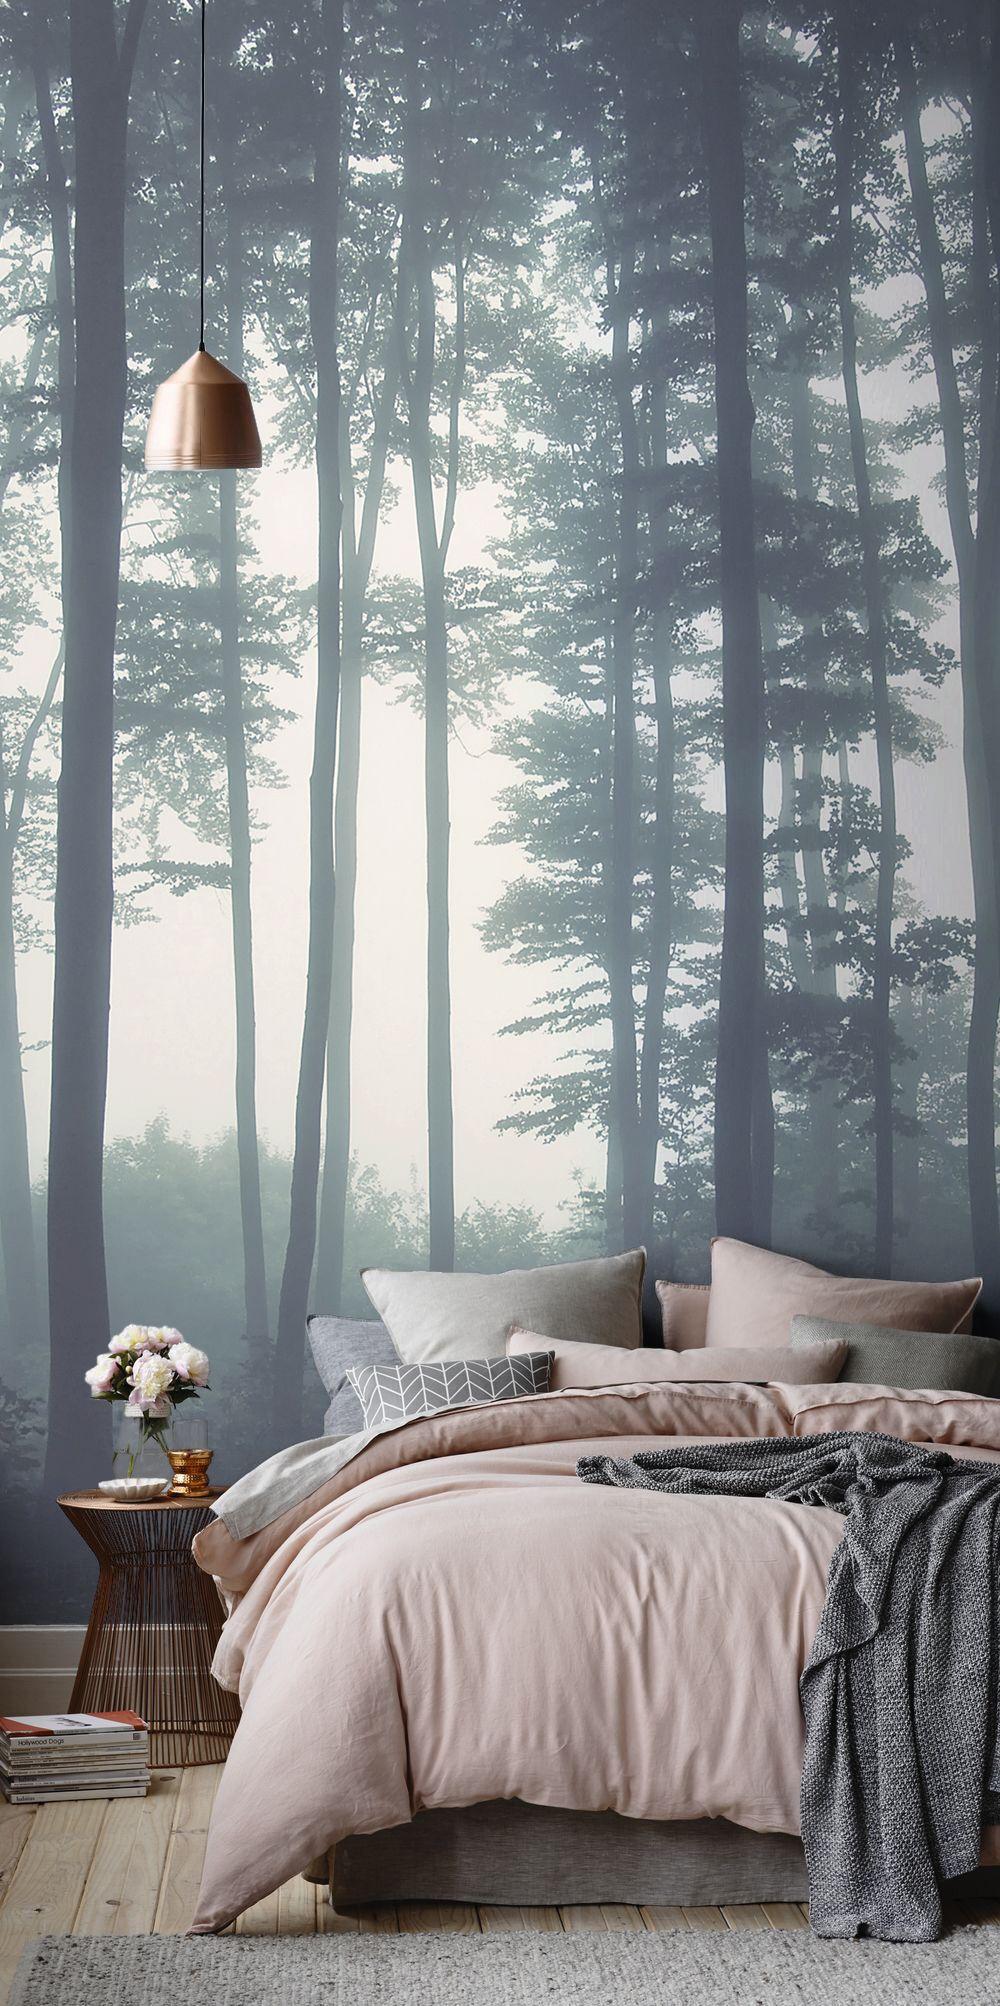 Sea of Trees Forest Mural Wallpaper | MuralsWallpaper.co ...